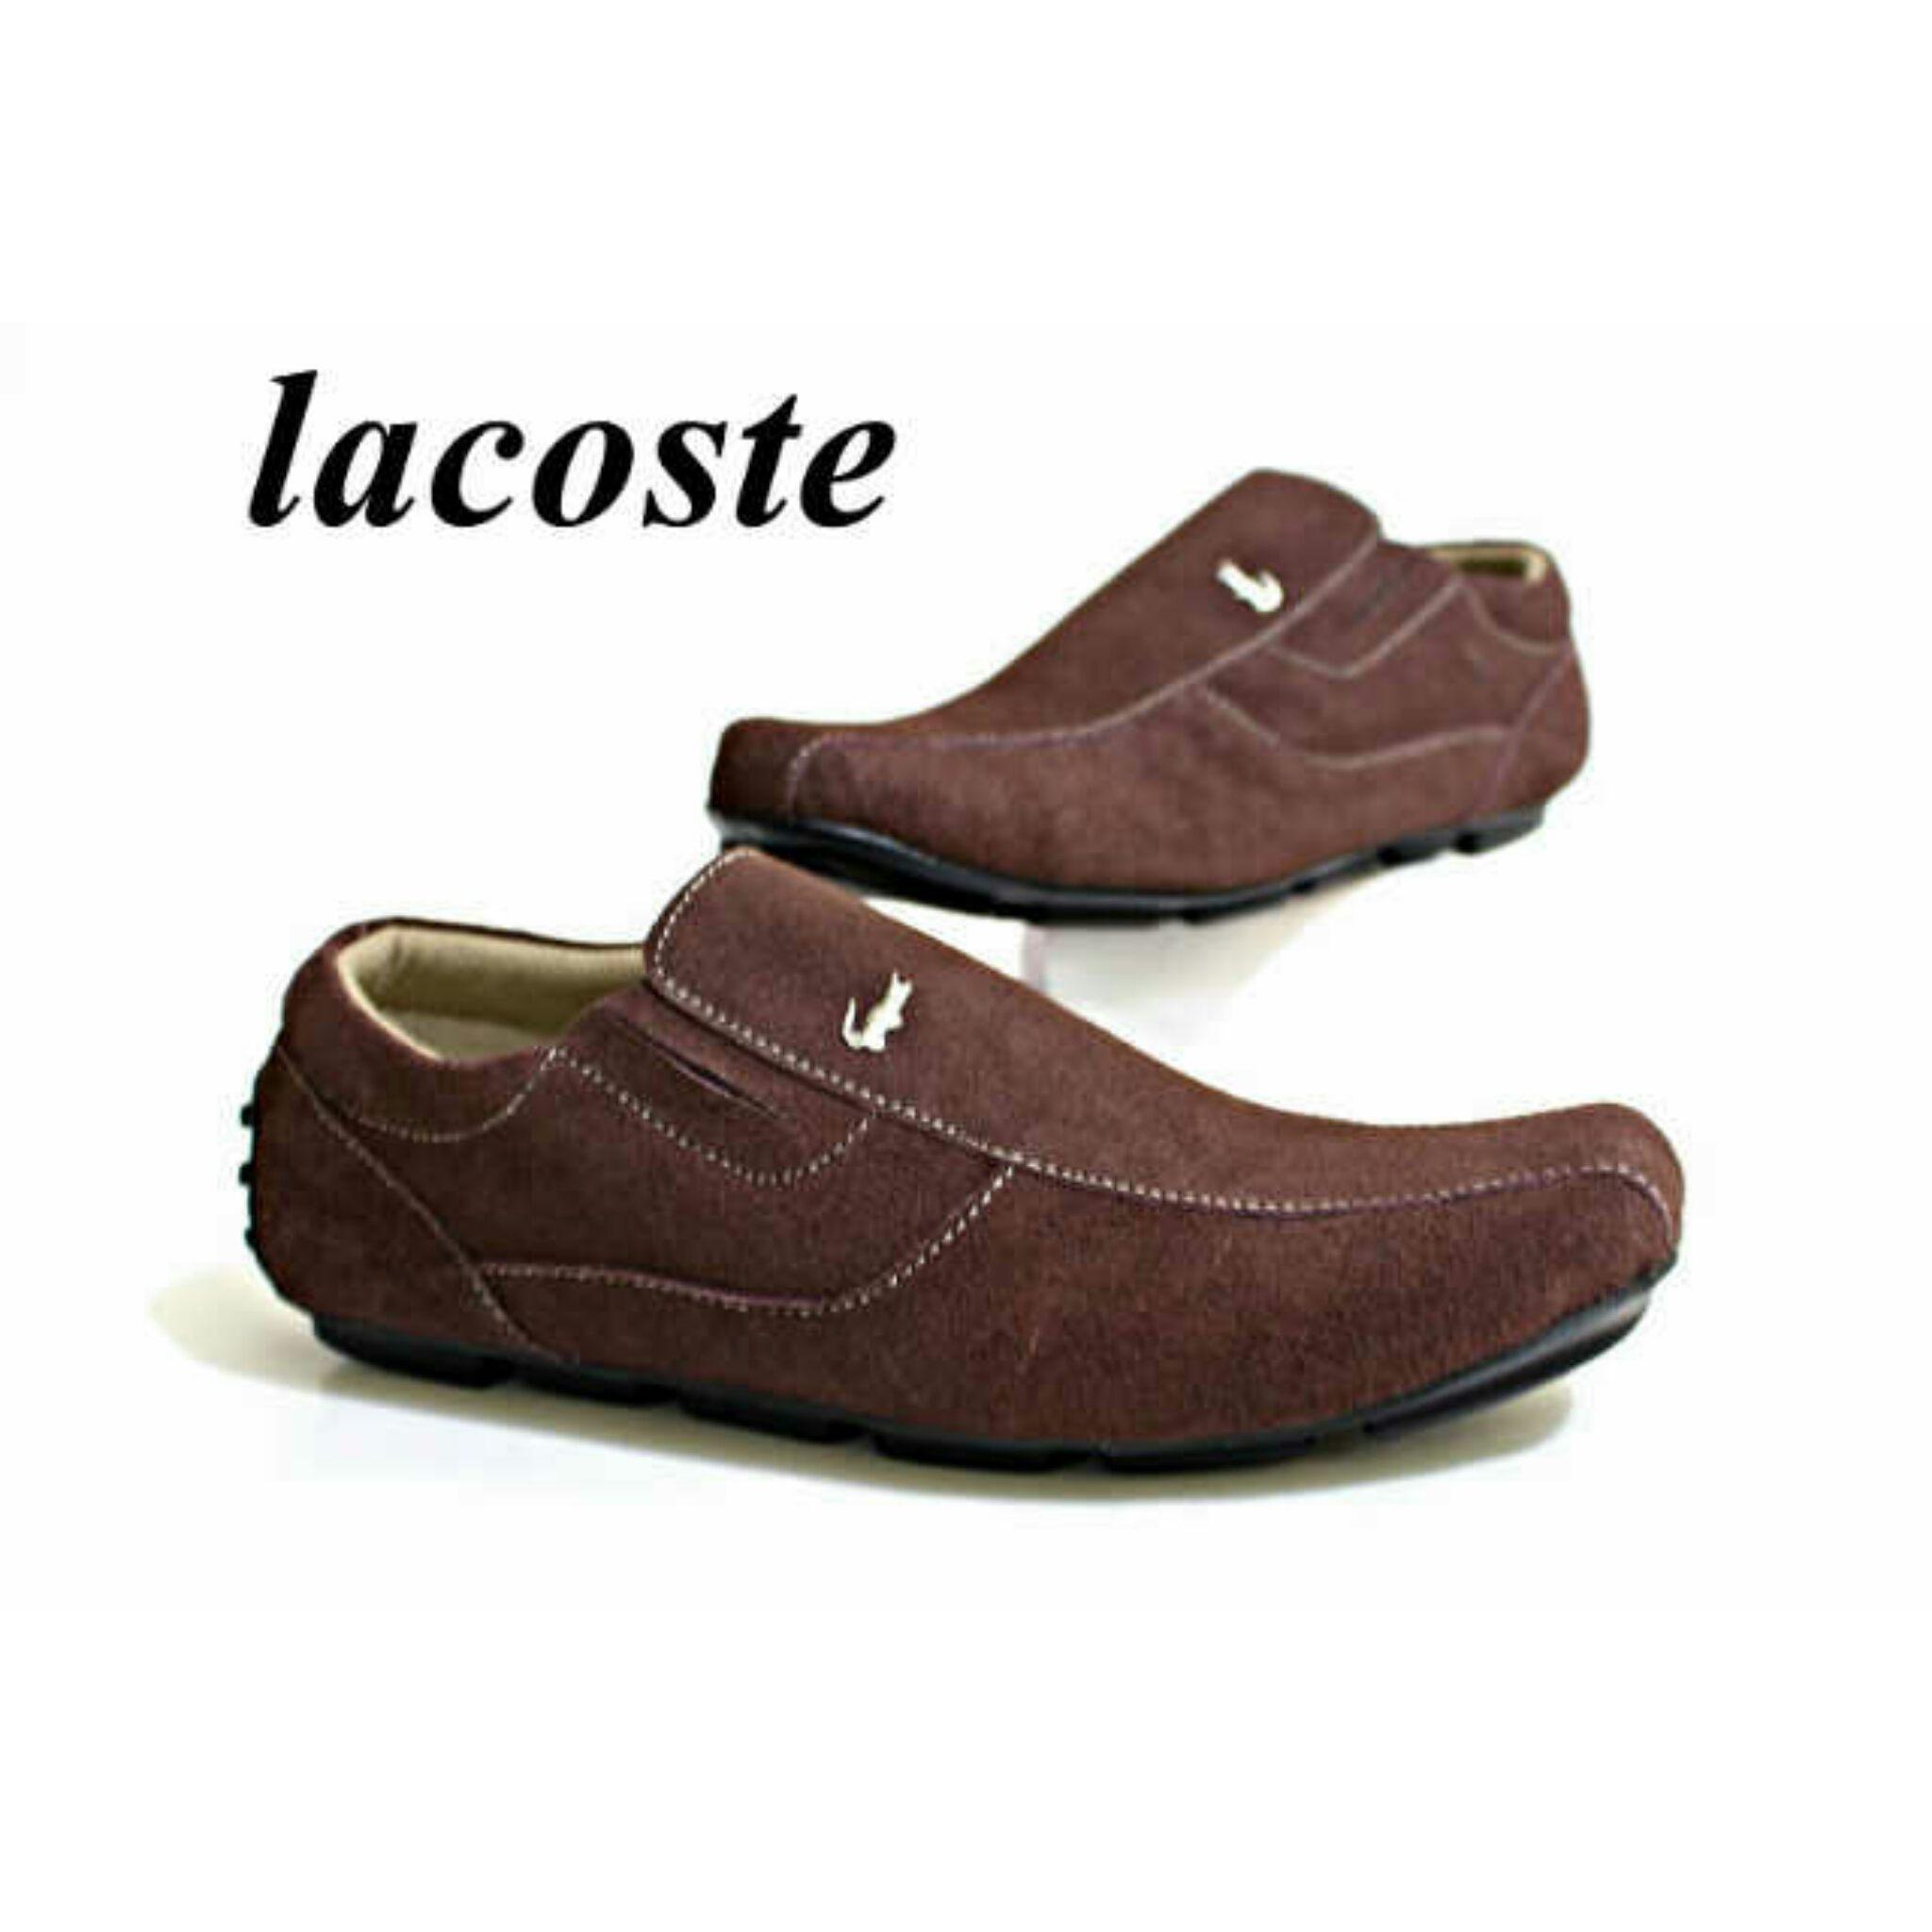 Jual Sepatu Pria Lacoste Terbaru Kulit Asli Sepatu Pria 27bcec0936